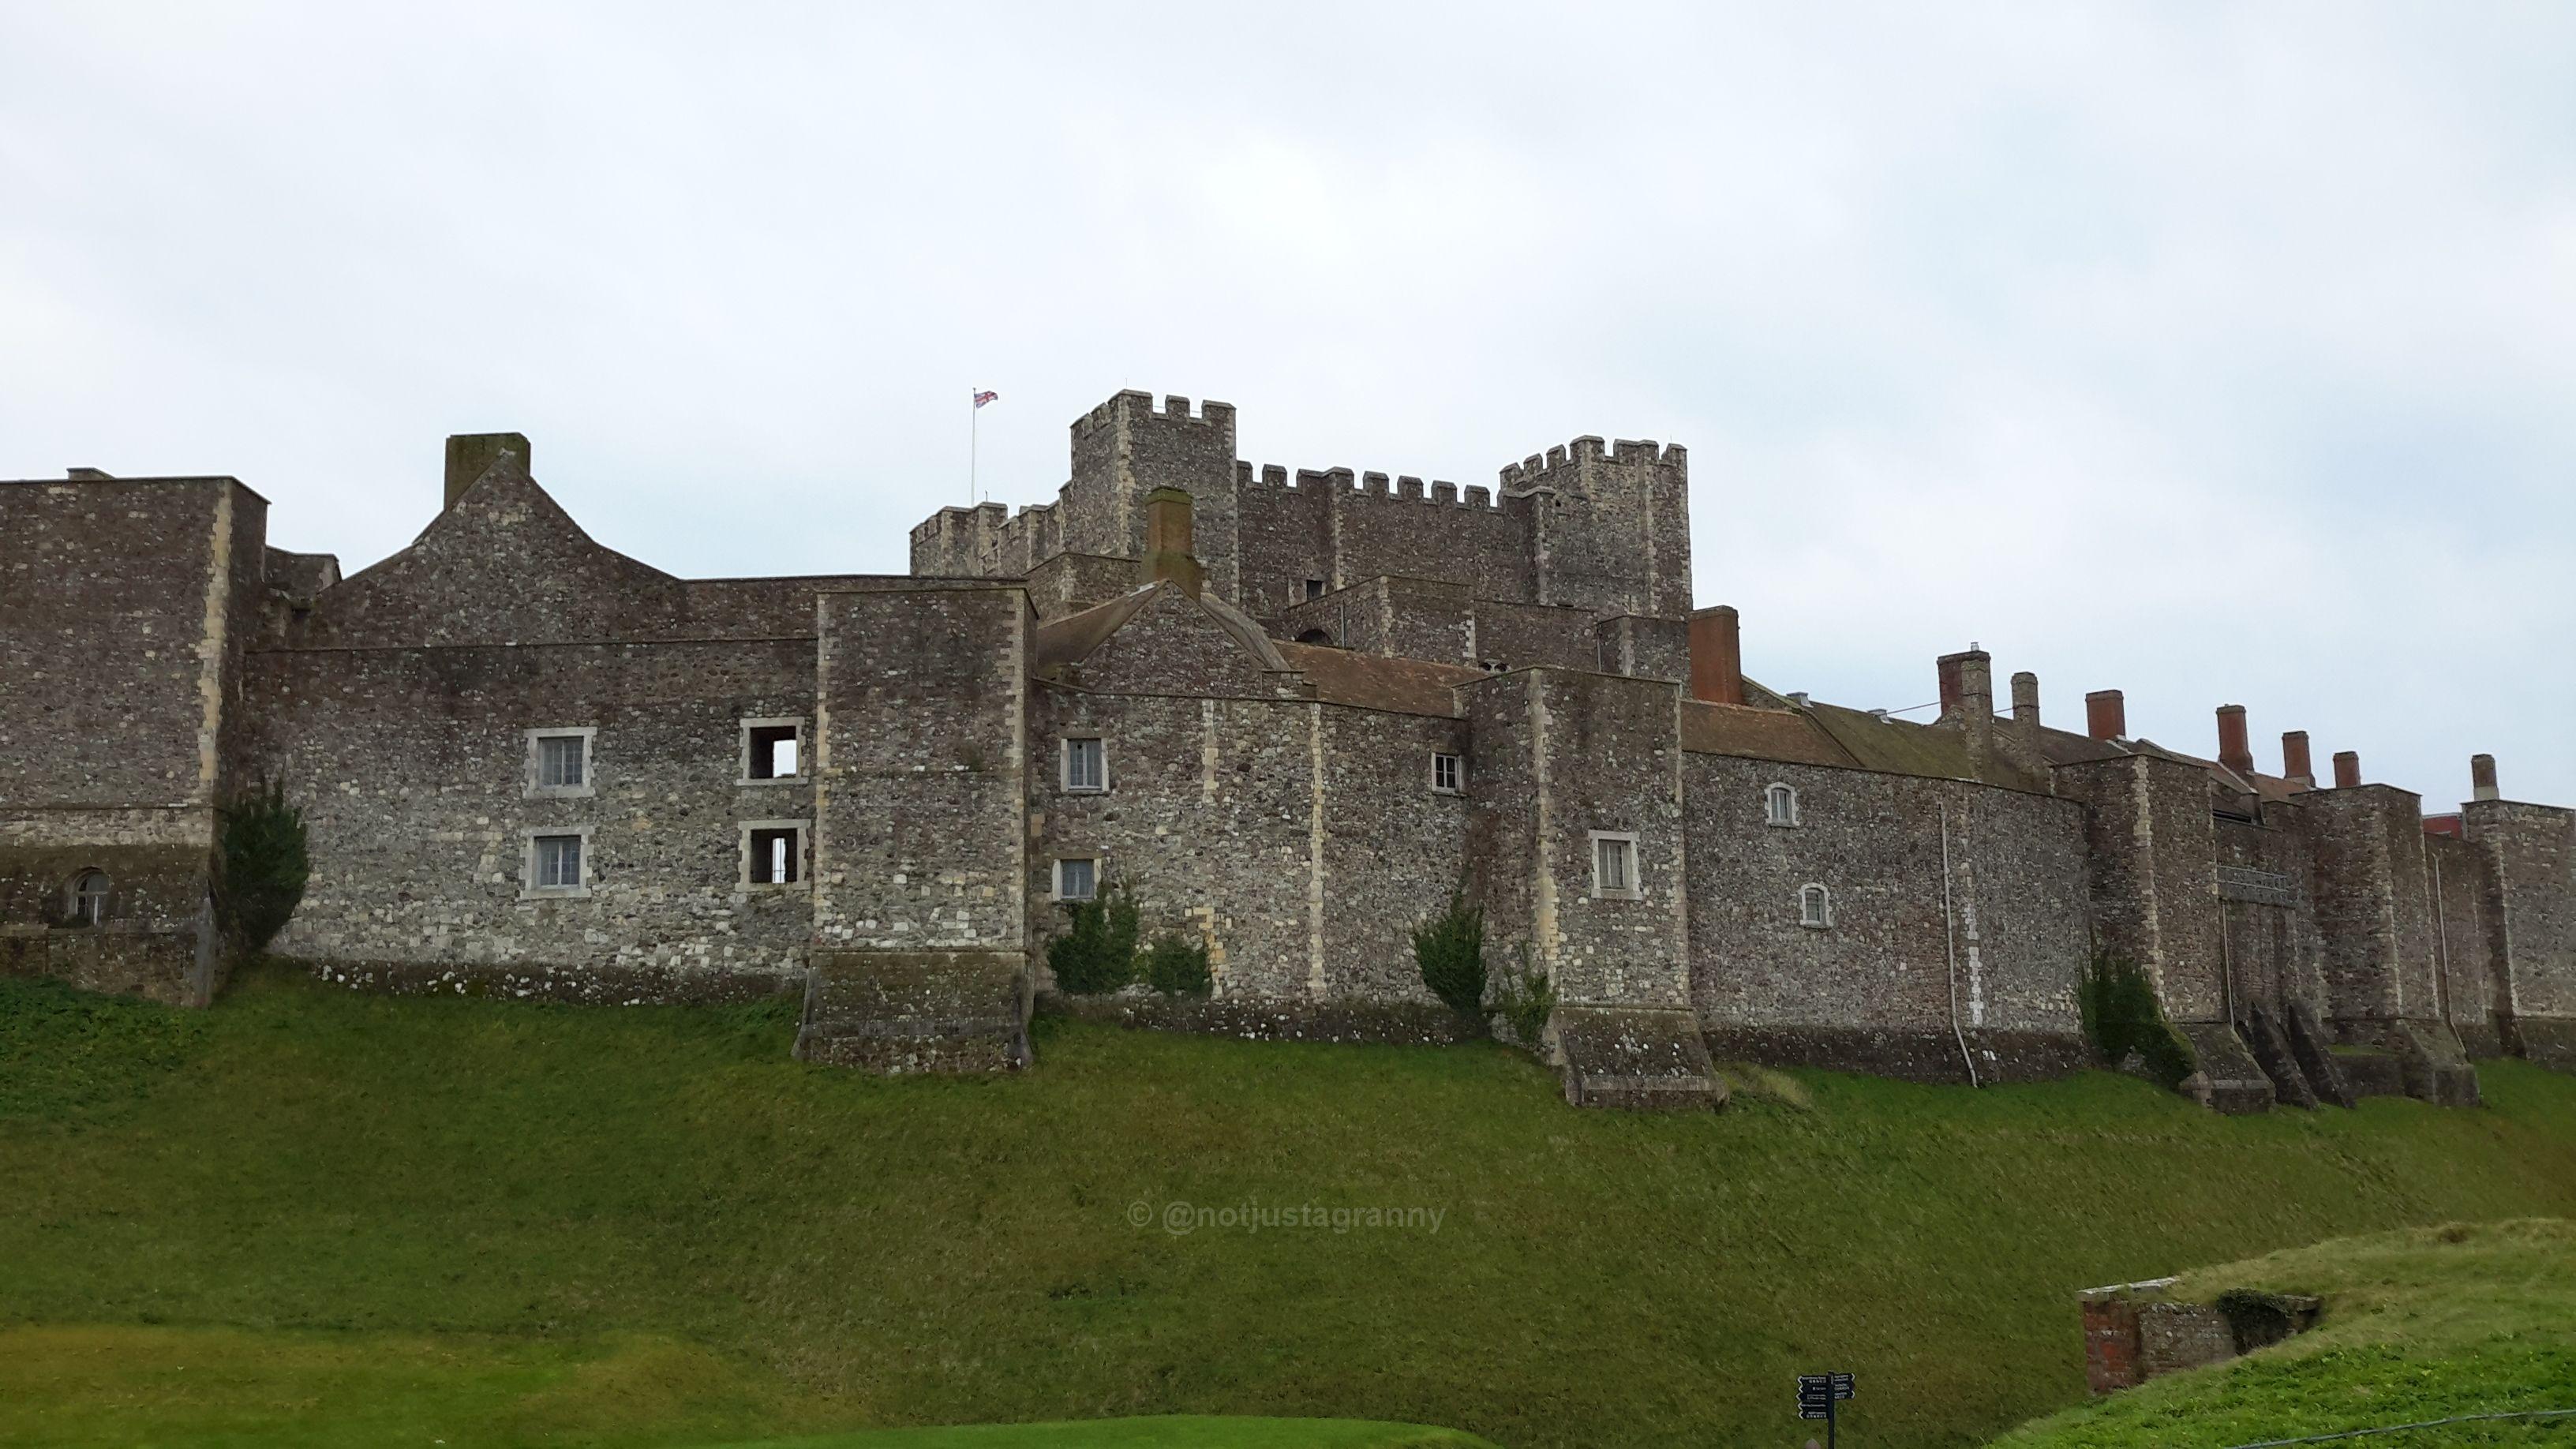 20160206_140417 - dover castle